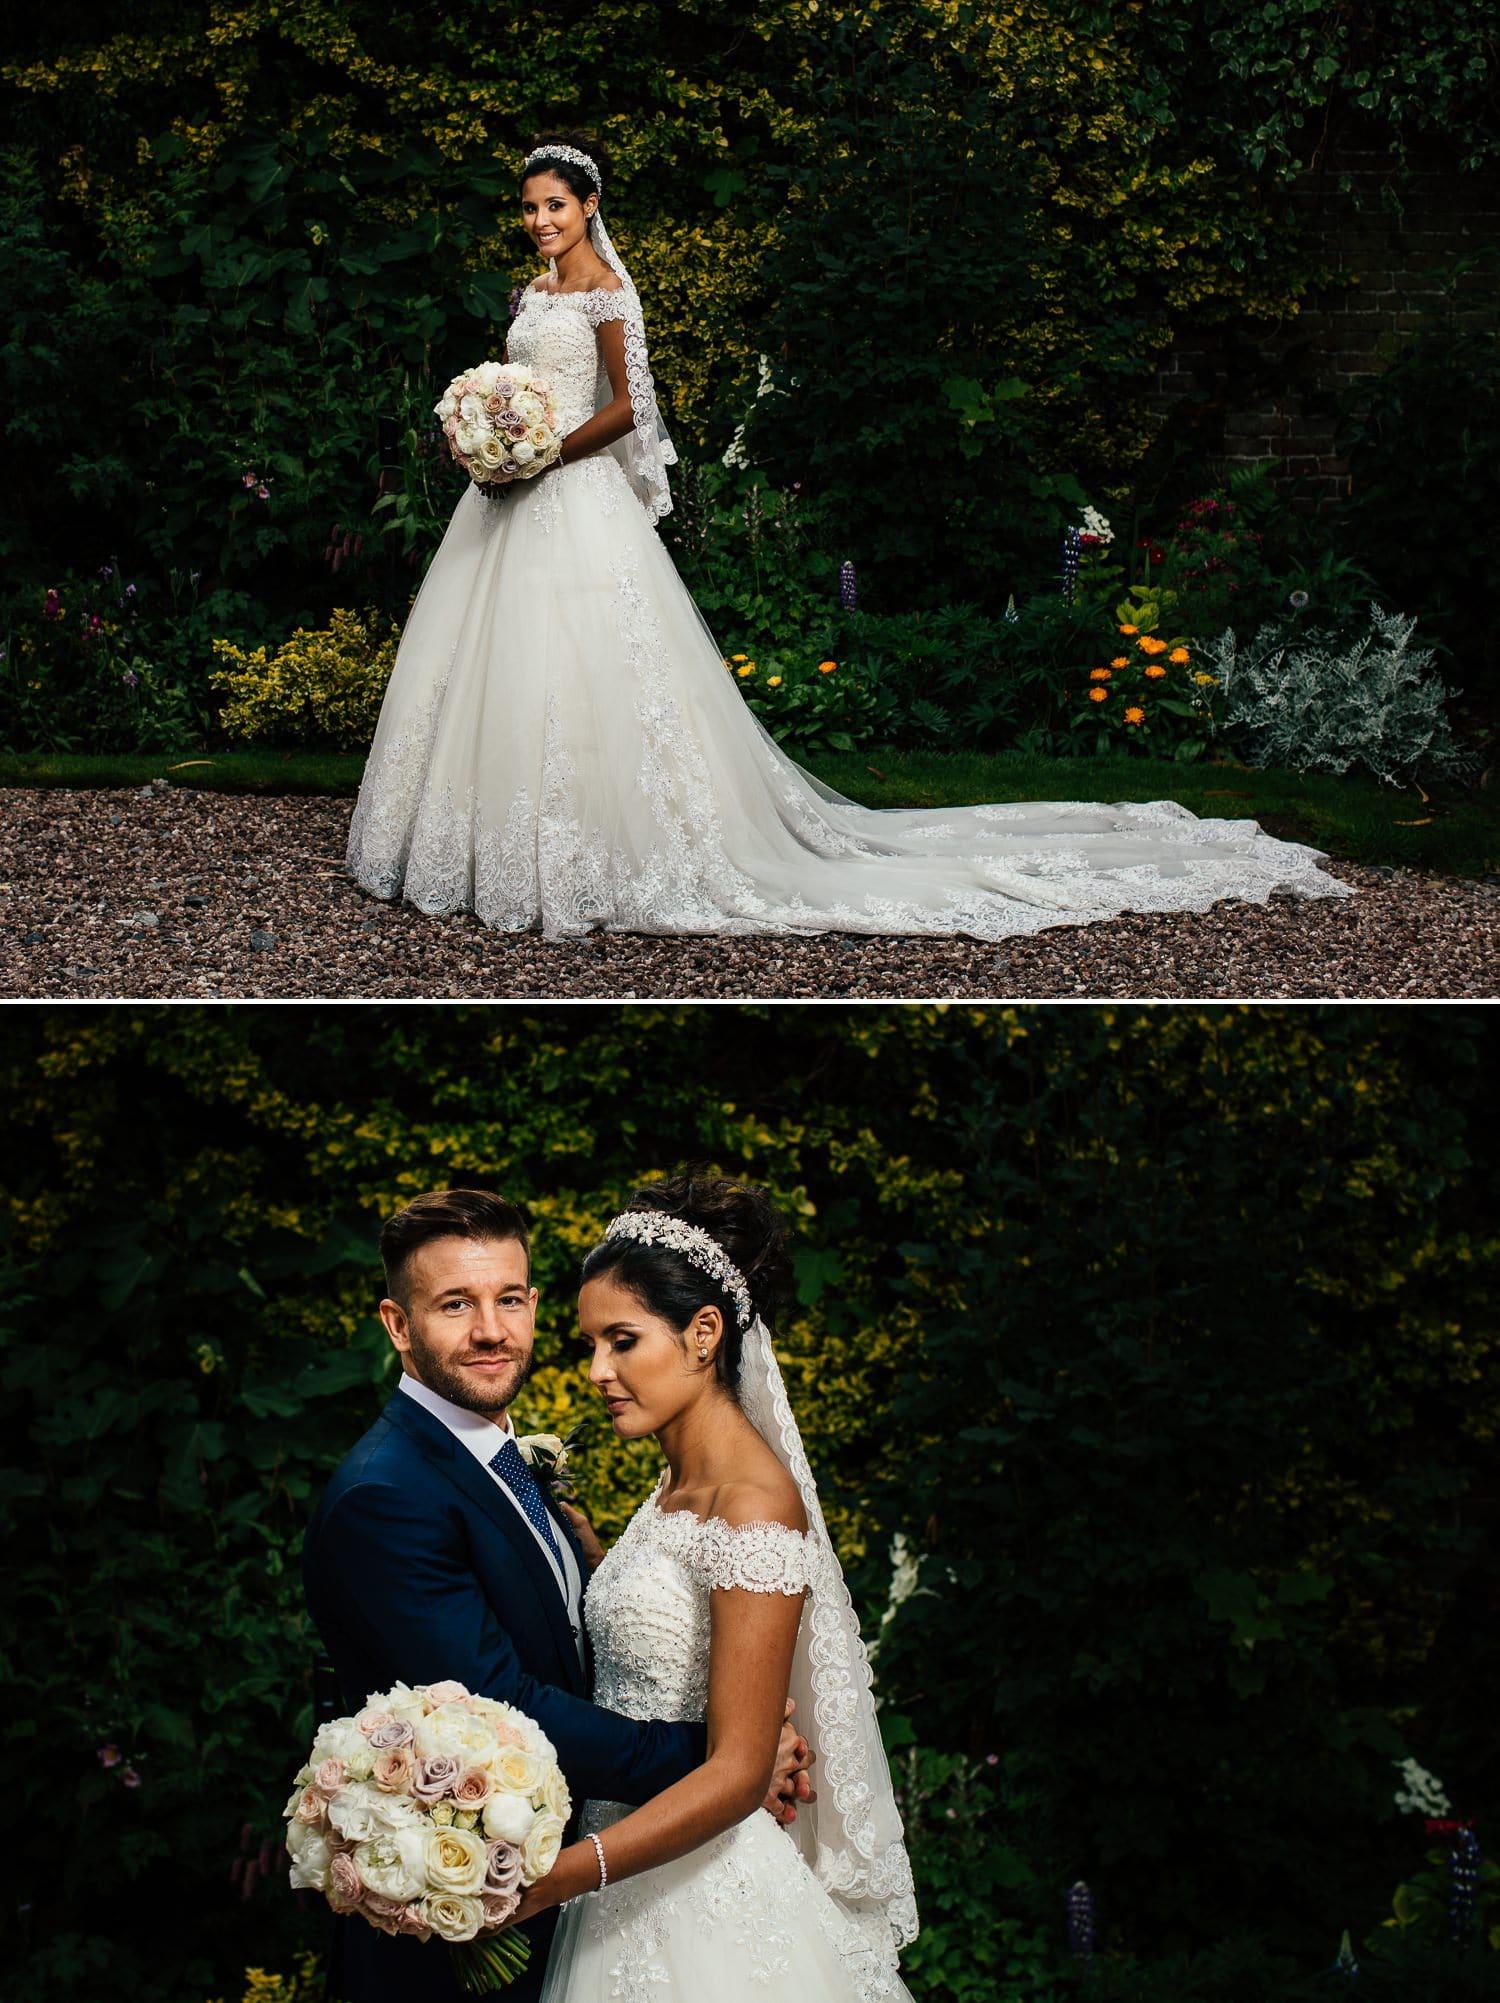 Wedding photography couple portraits  in wedding gardens at Soughton Hall